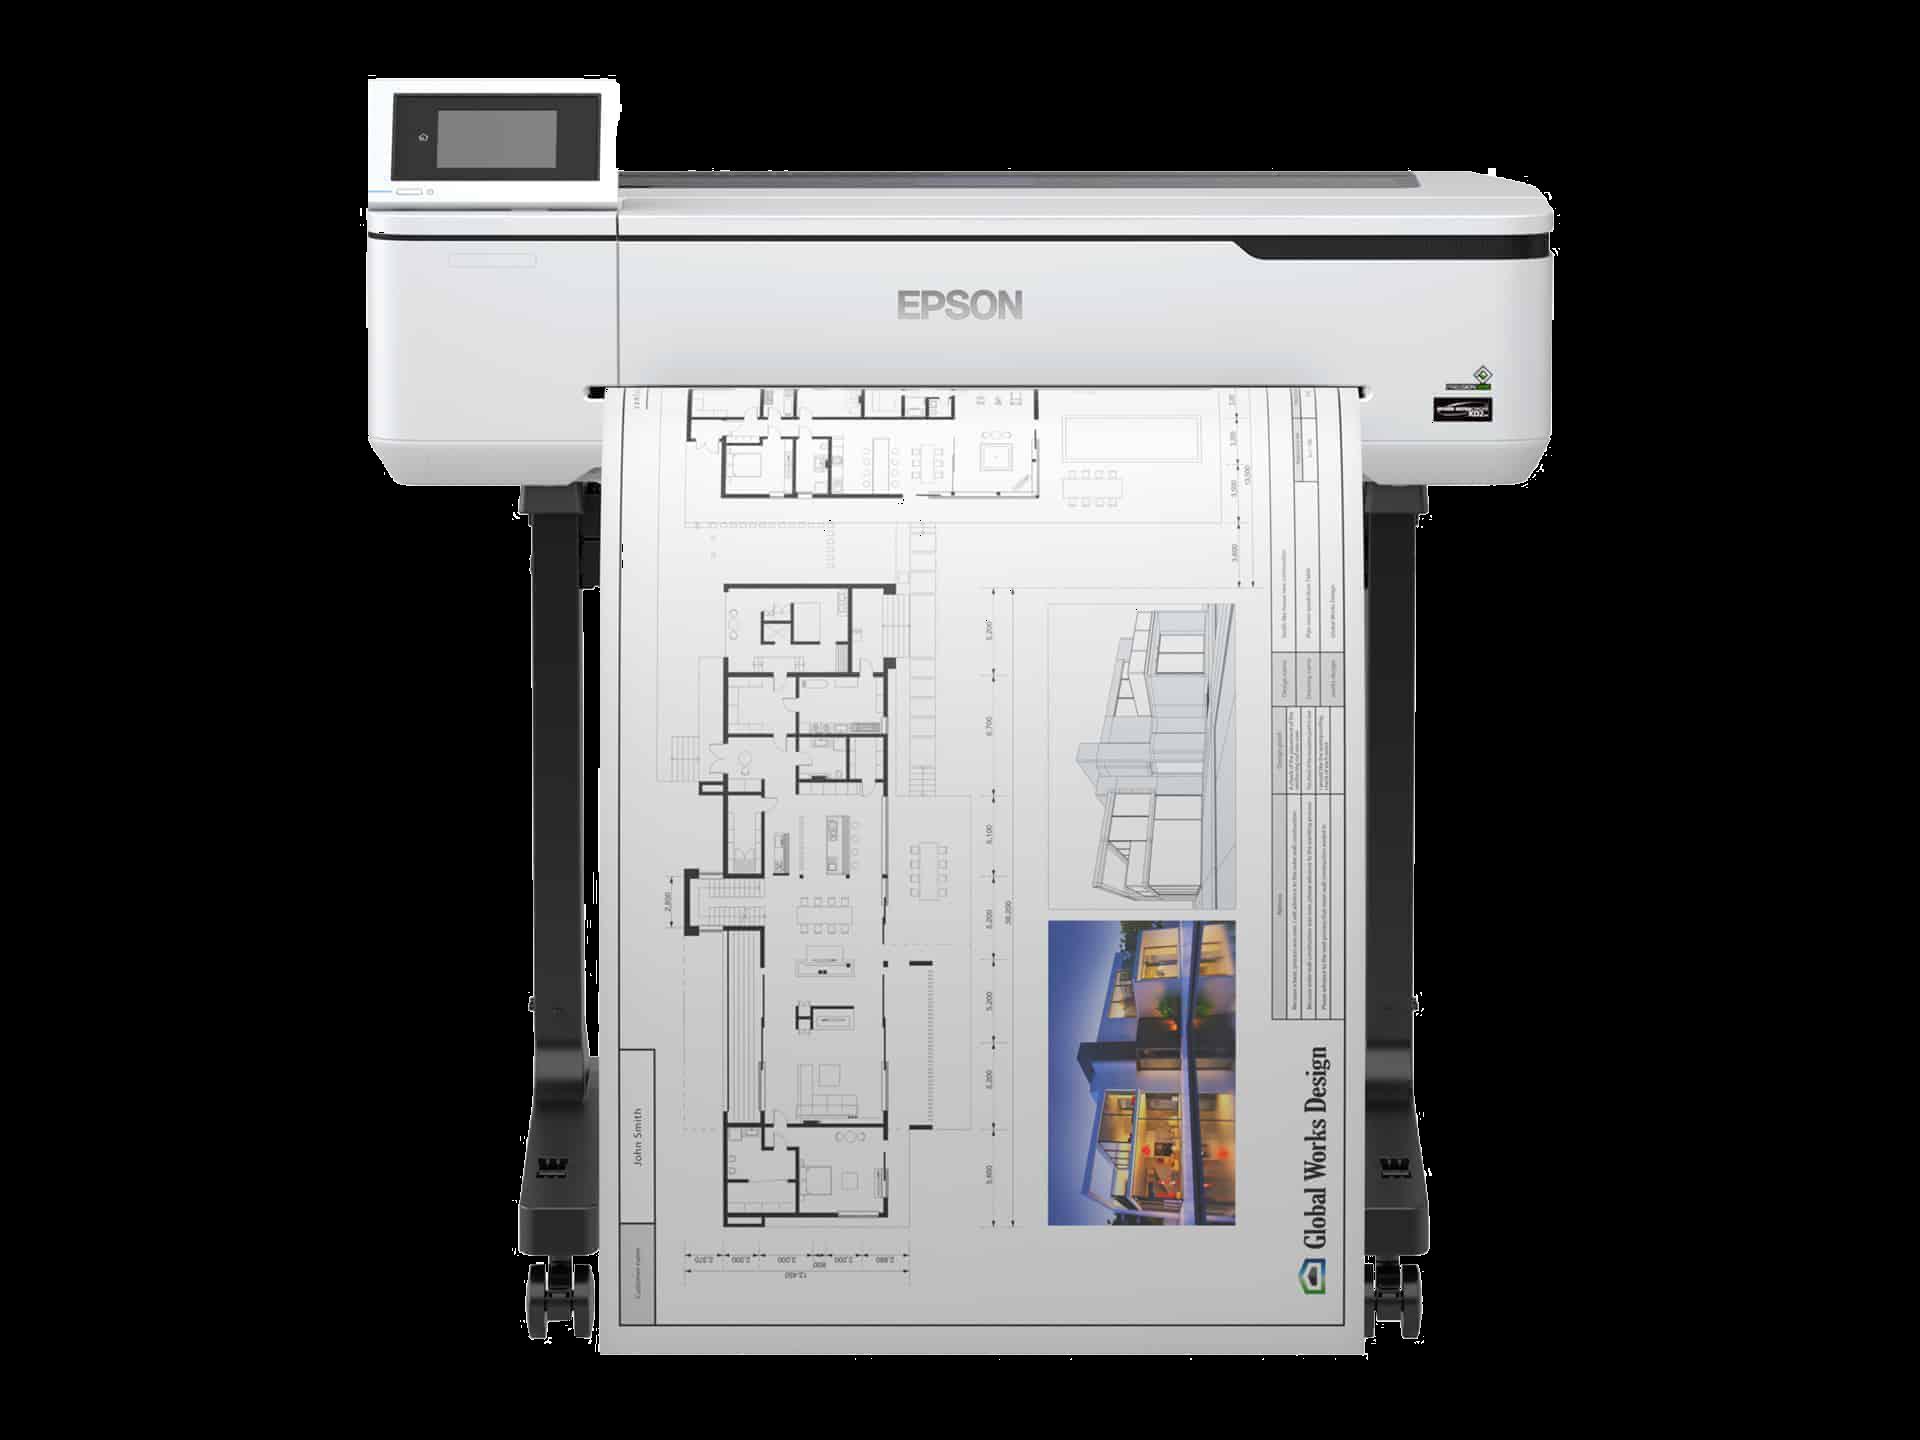 Epson surecolor SC_3100 (CAD)